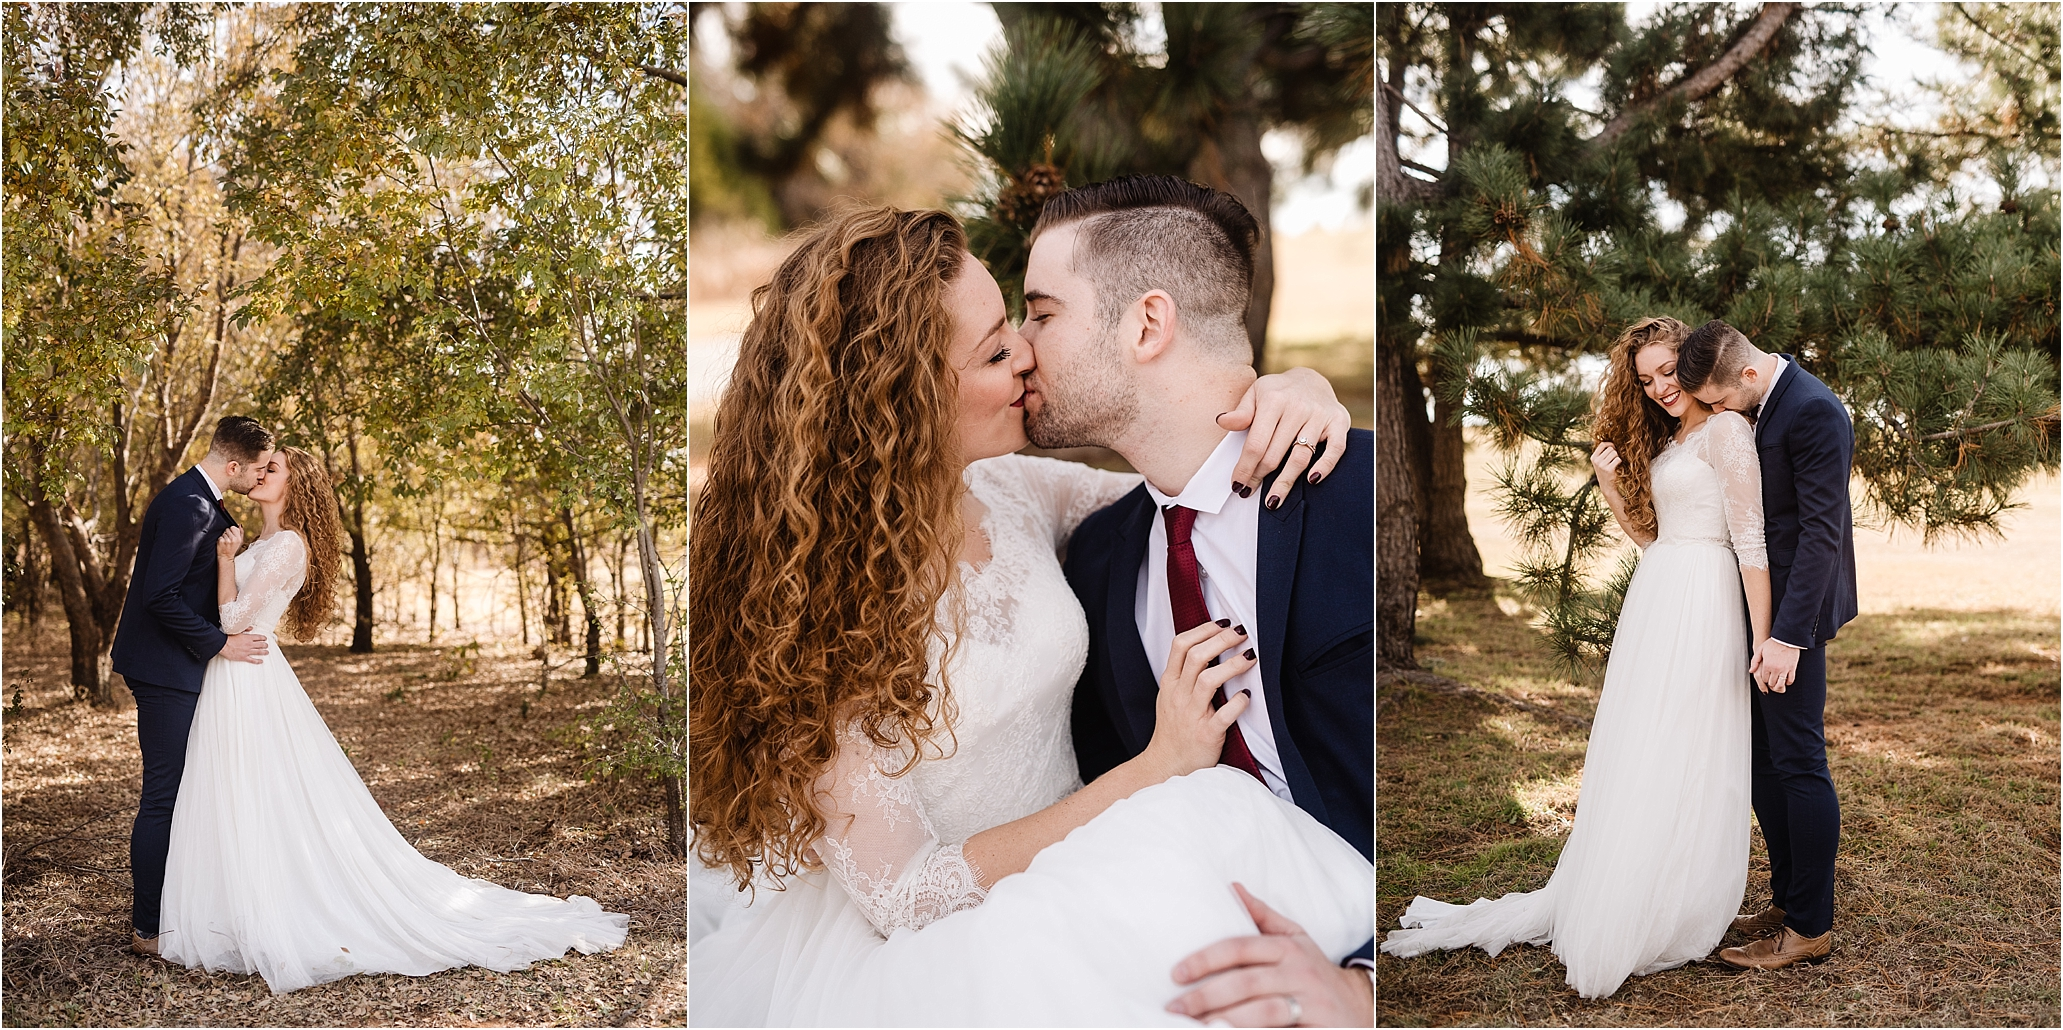 oklahoma wedding photographer bride groom wedding day outside